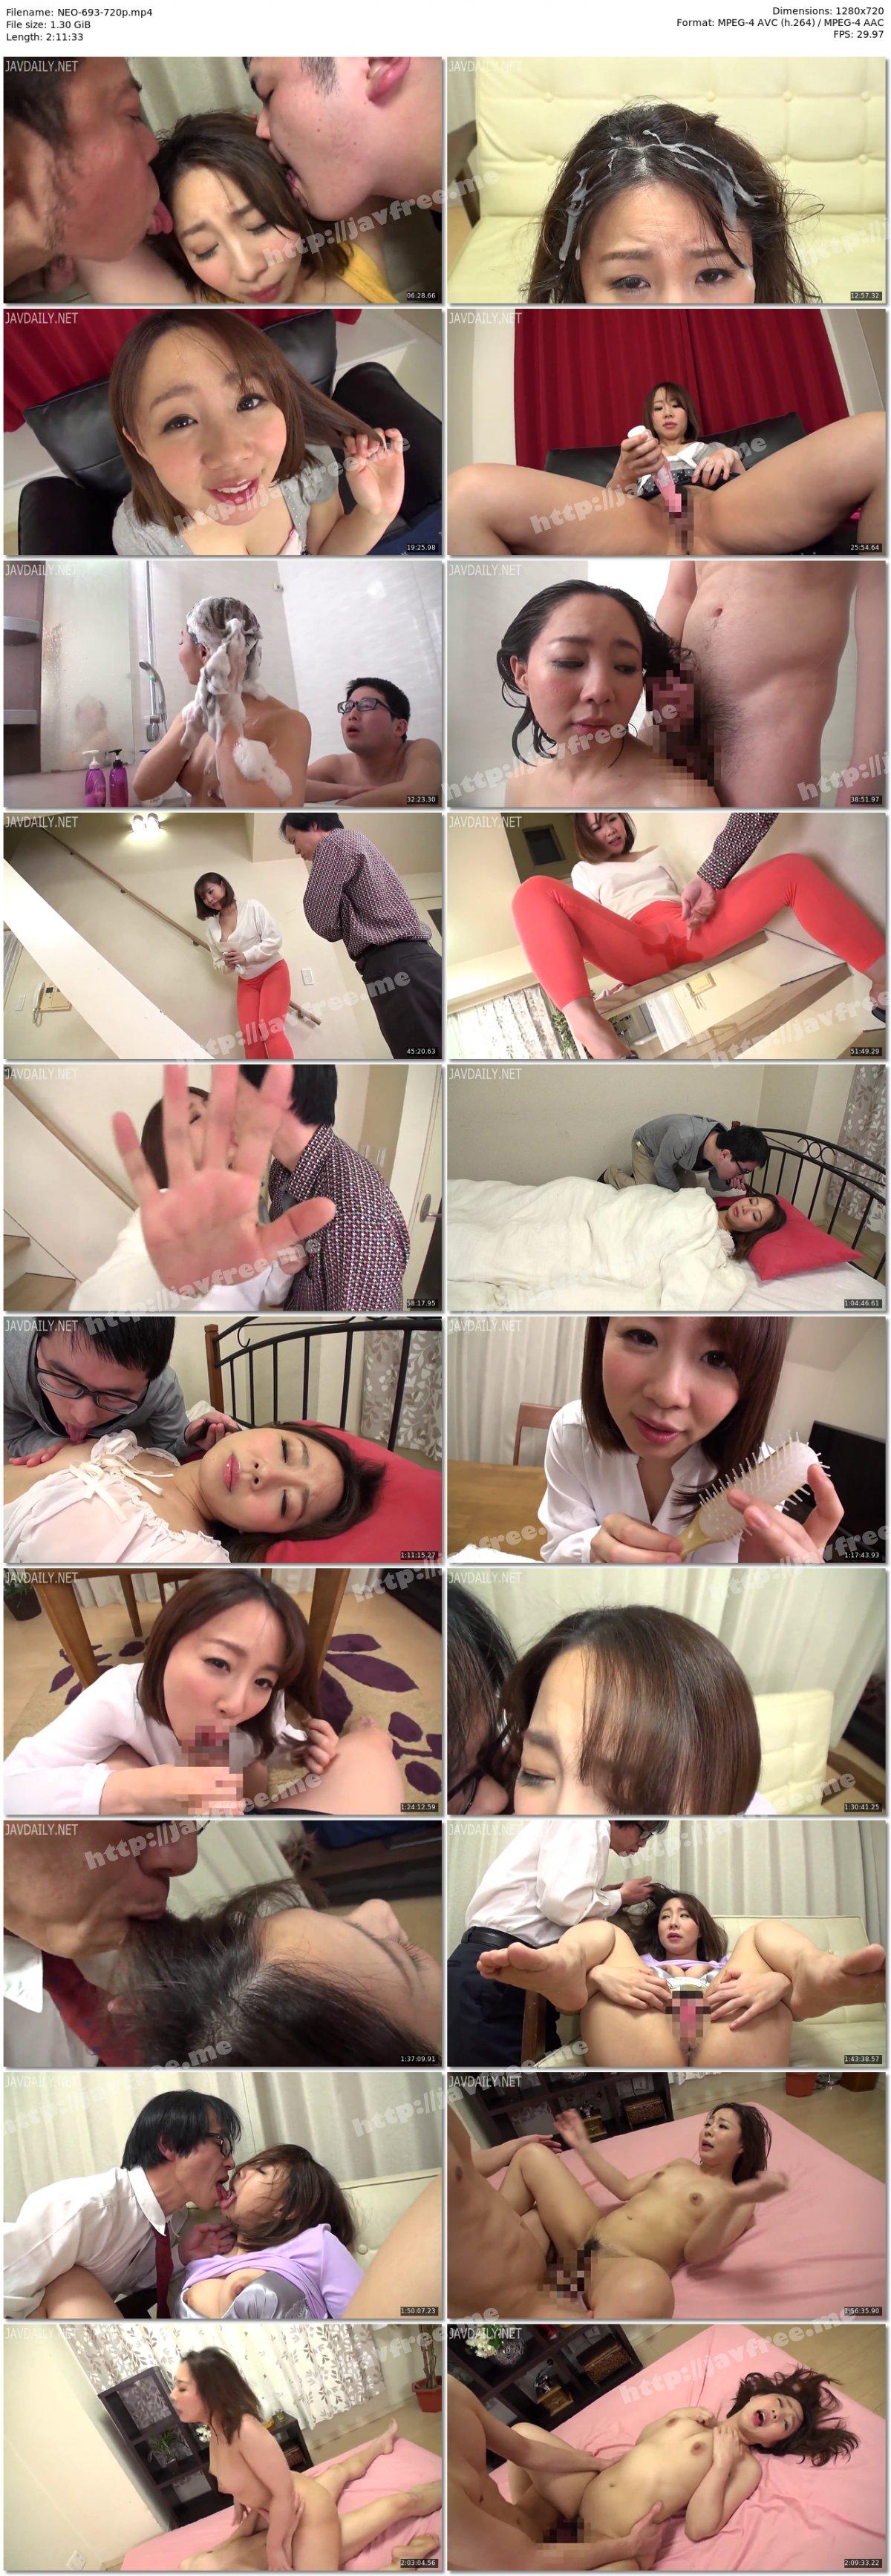 [HD][NEO-693] 熟女の髪を汚したい ~髪射~ 成宮いろは - image NEO-693-720p on https://javfree.me